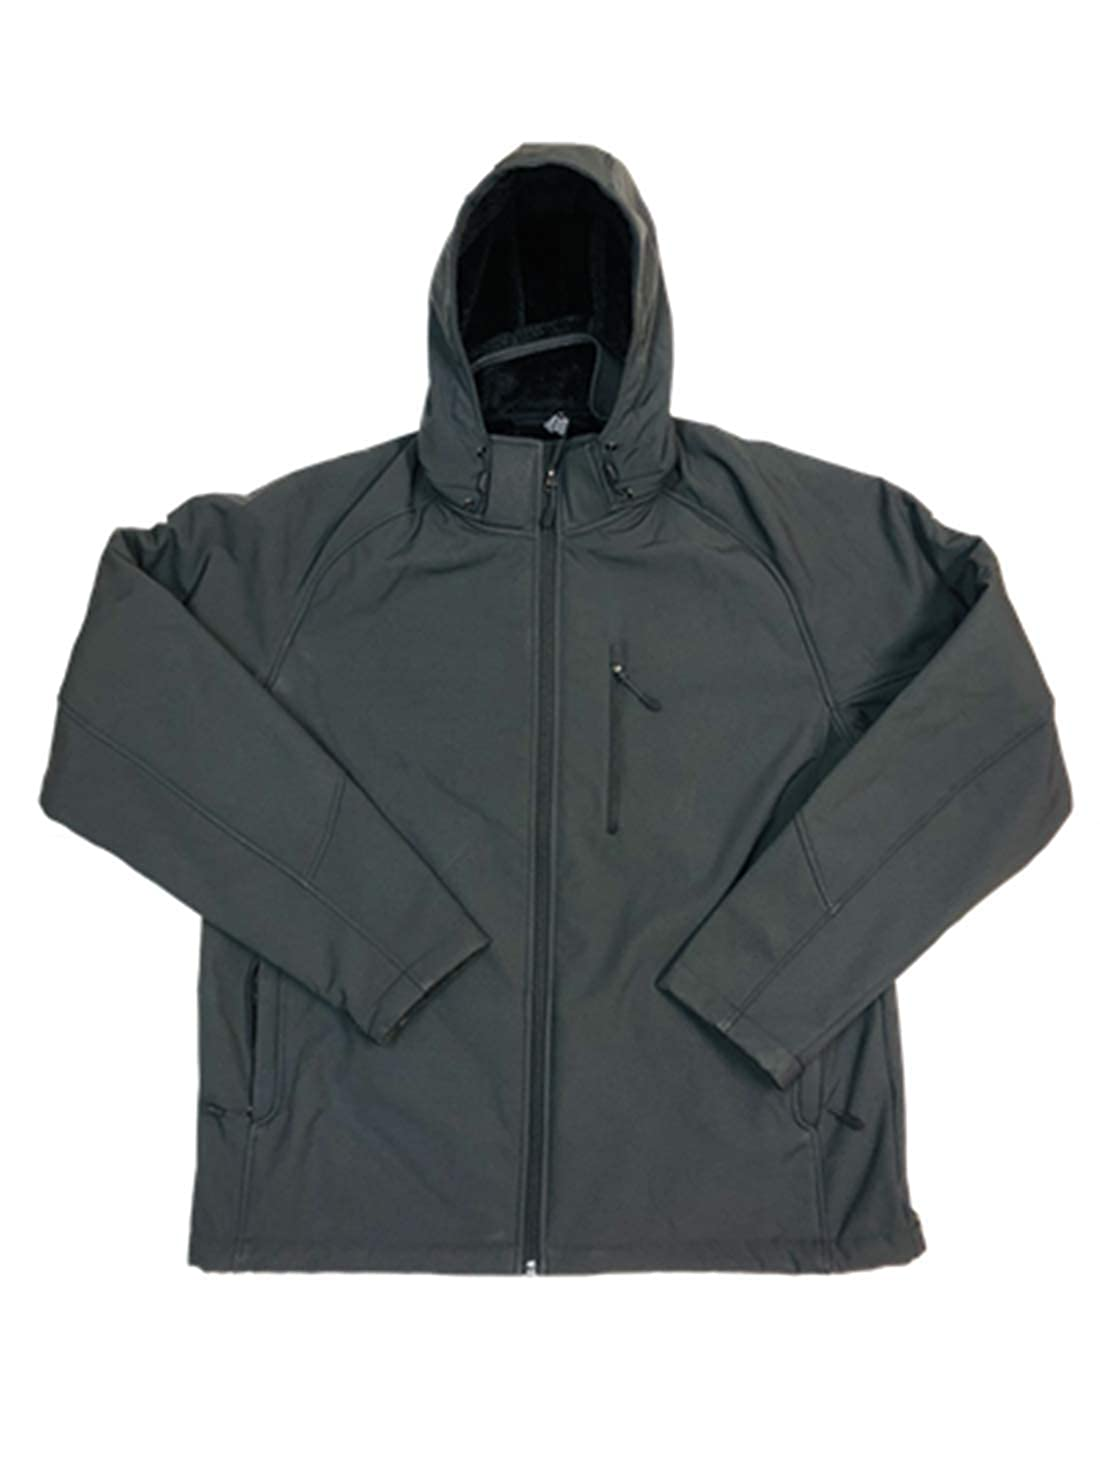 Kirkland Signature Mens Sherpa Lined Softshell Detachable Hood